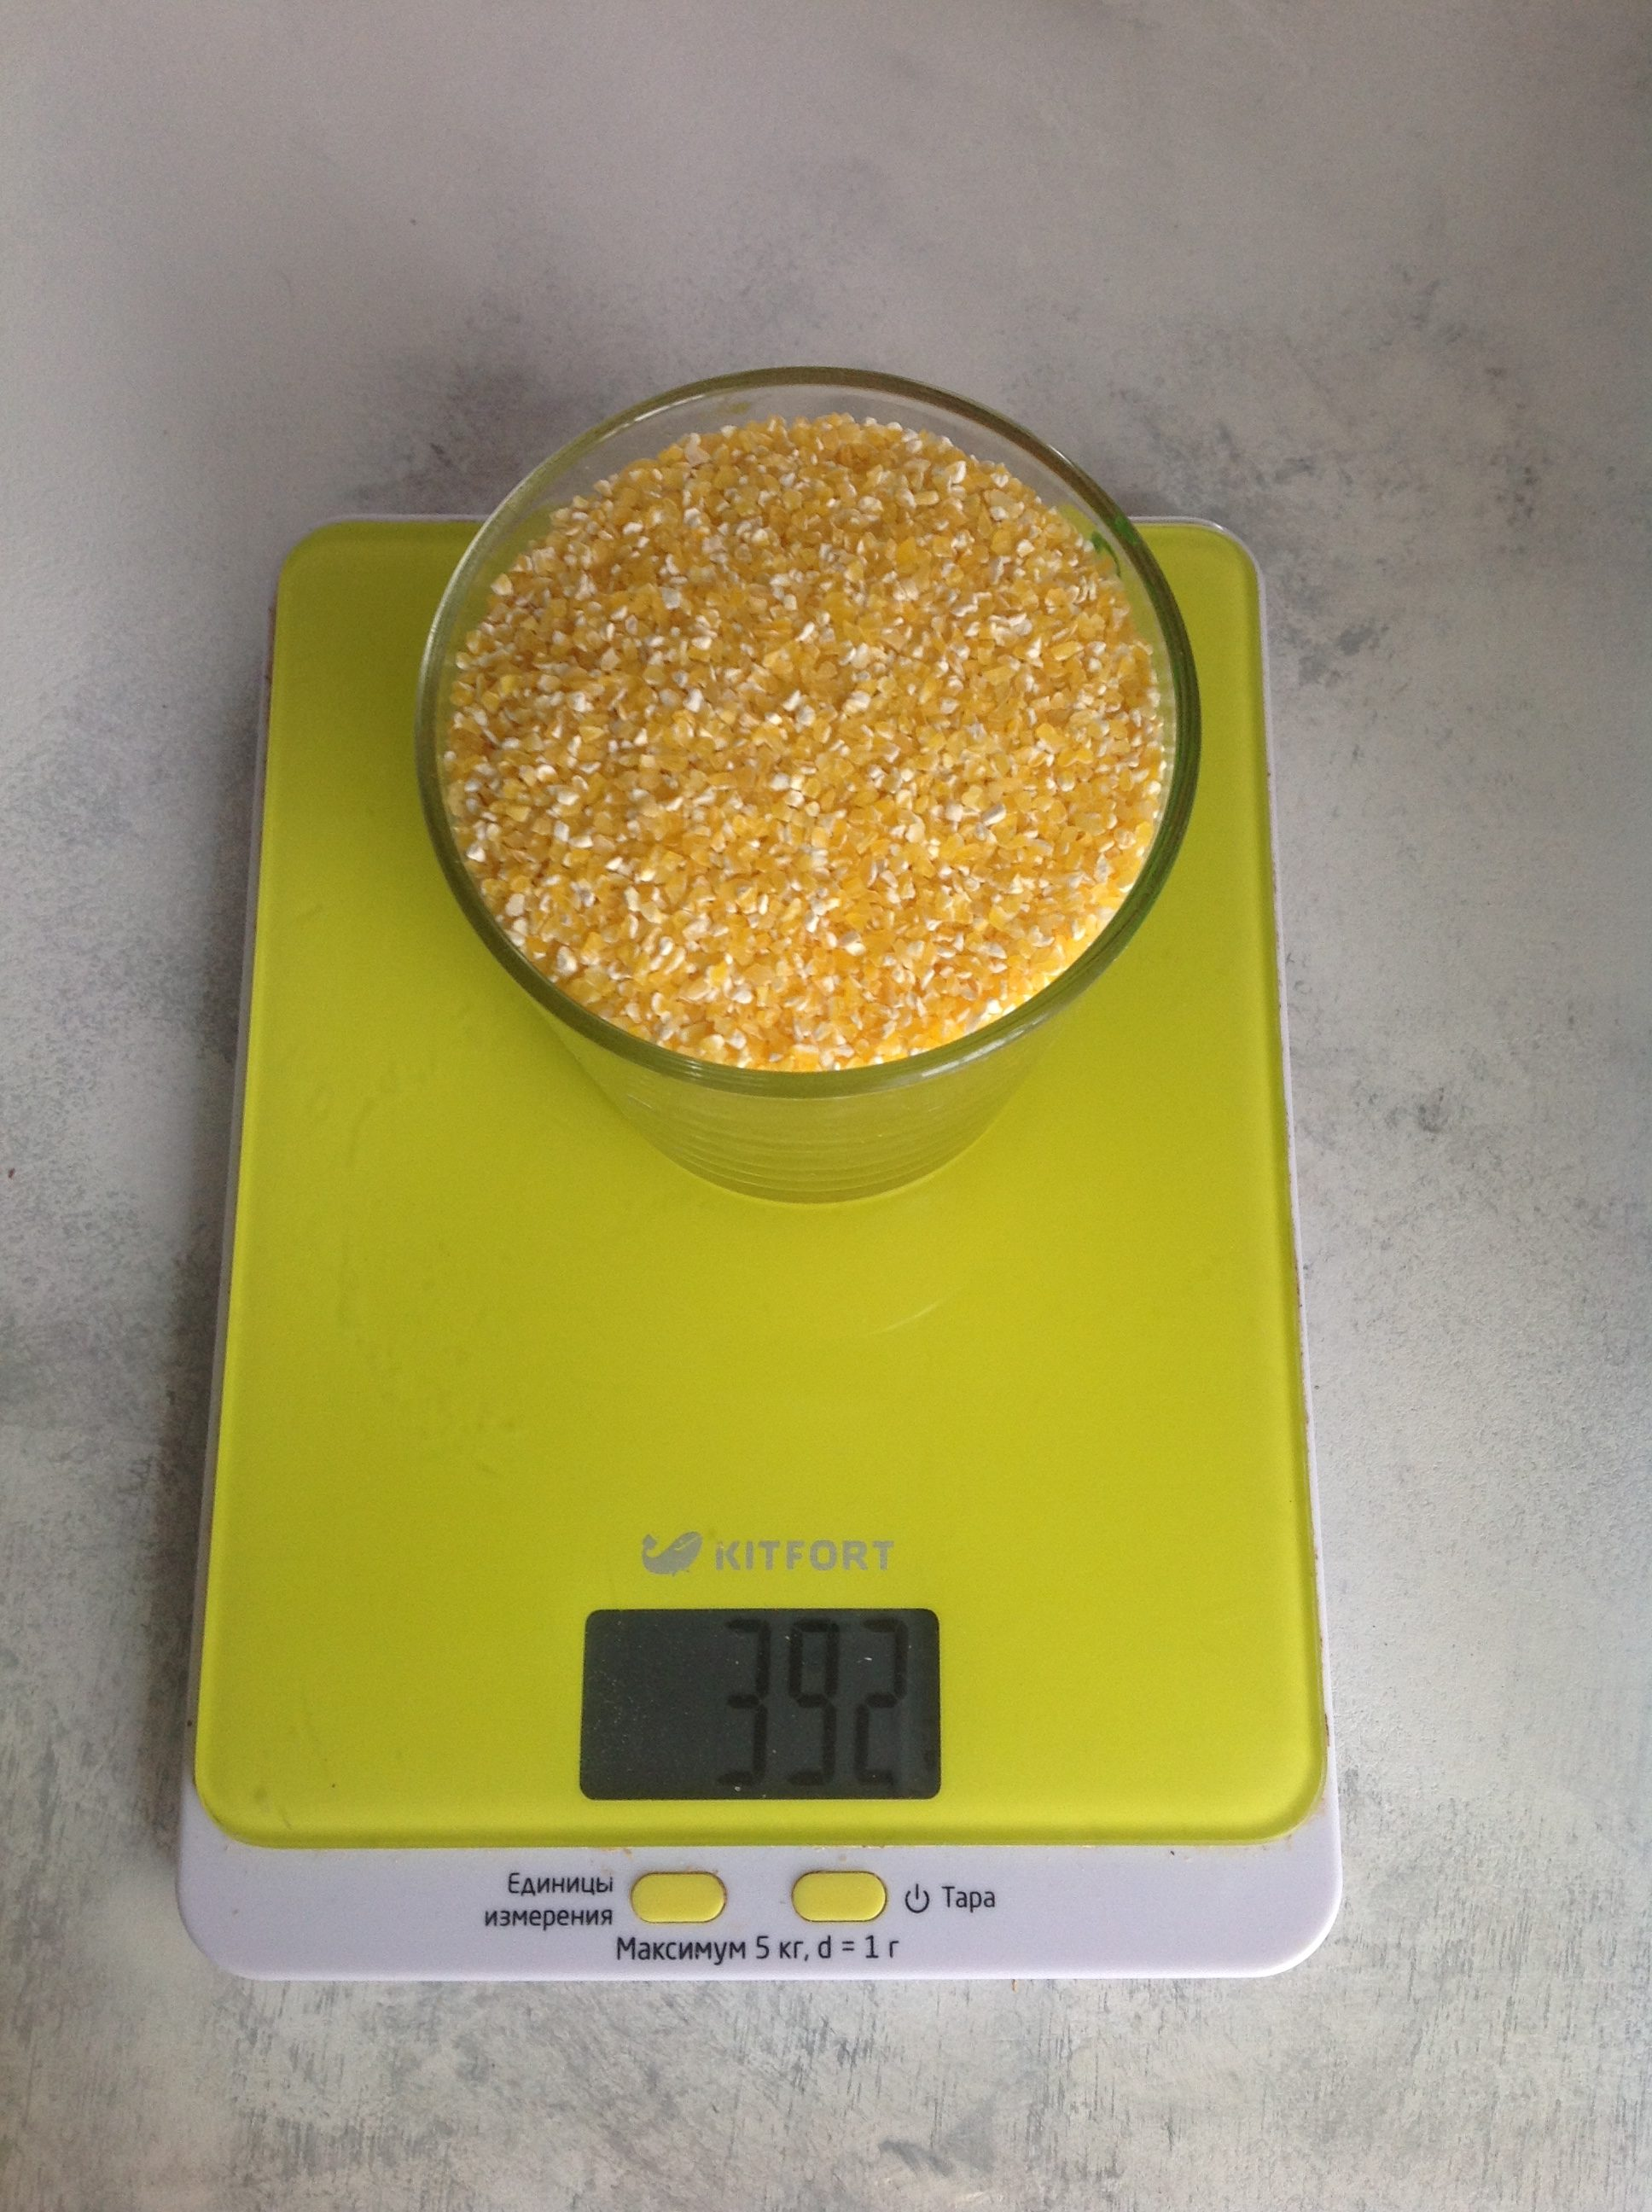 вес кукурузной крупы сухой в стакане 250 мл